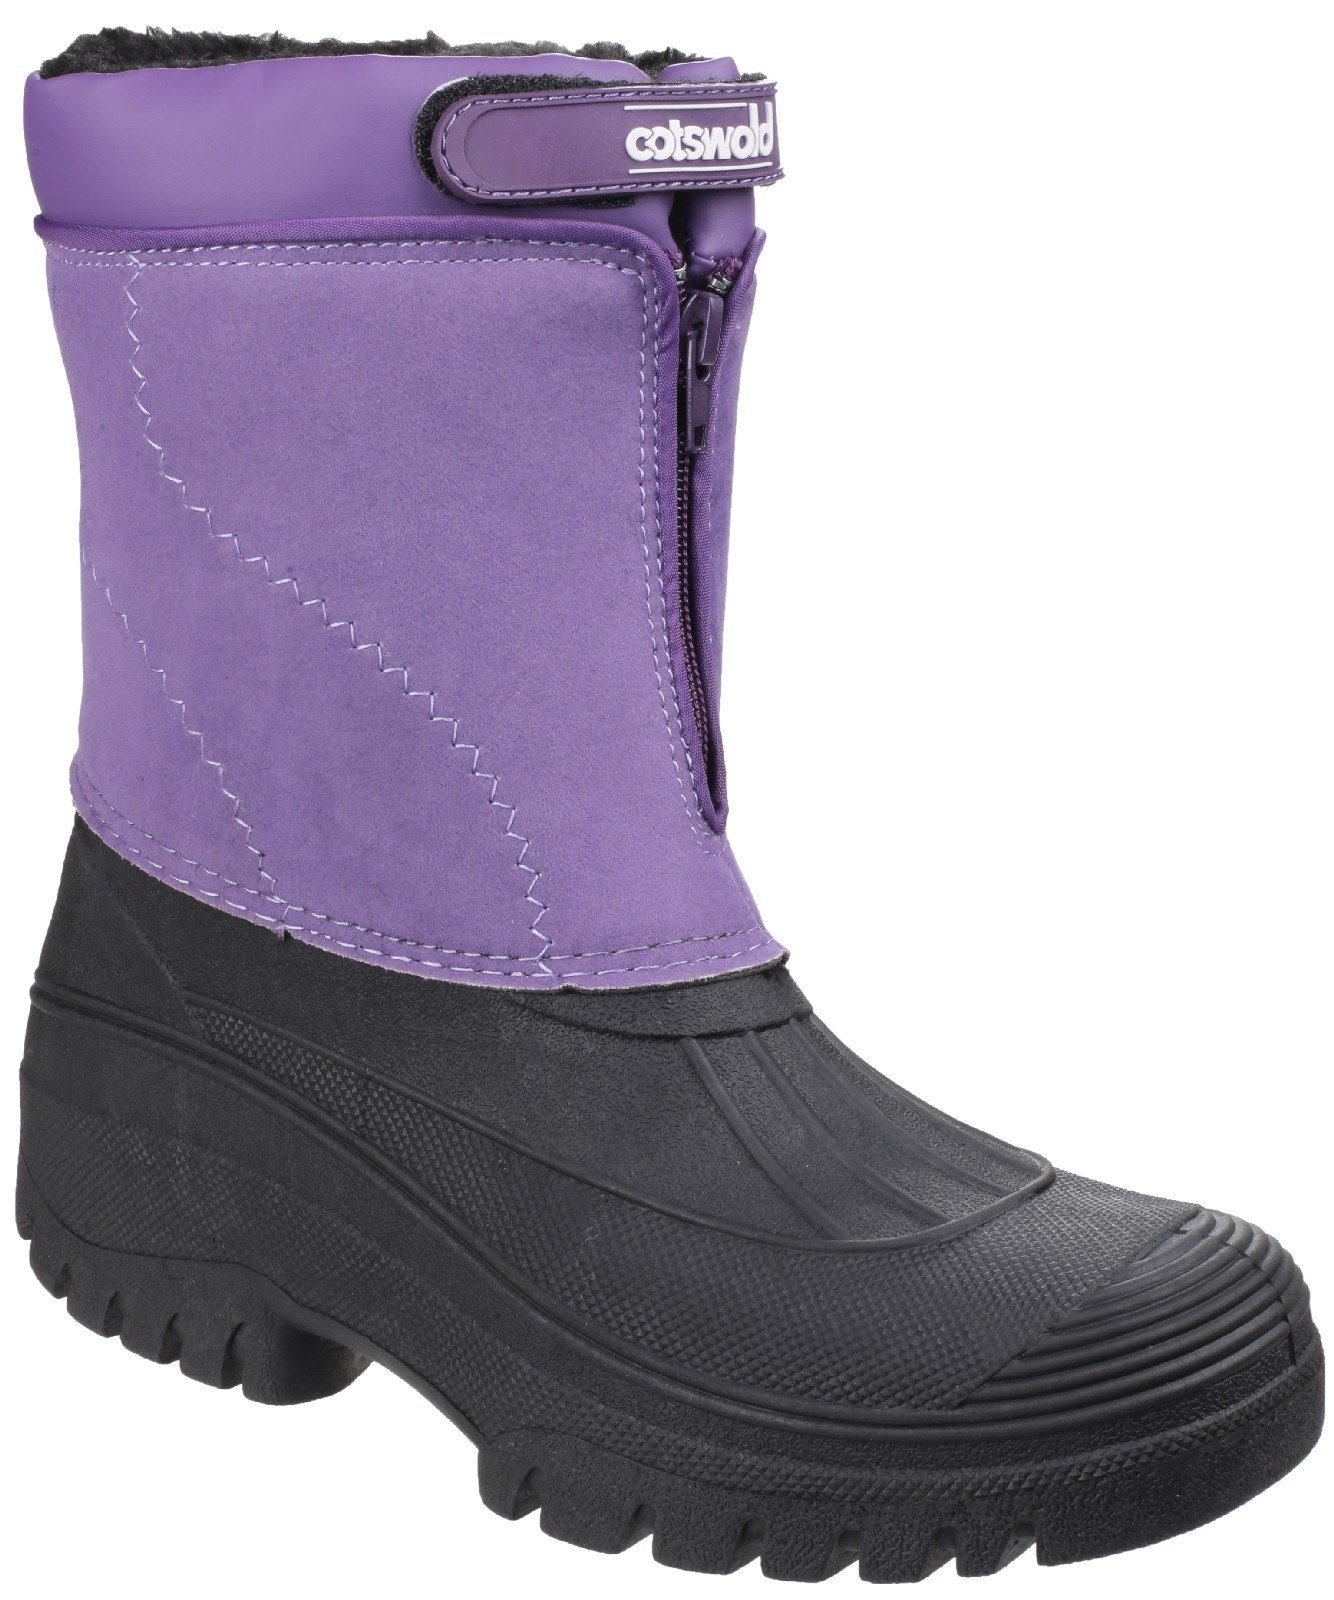 Cotswold Women's Venture Waterproof Winter Boot Various Colours 16569 - Purple 2